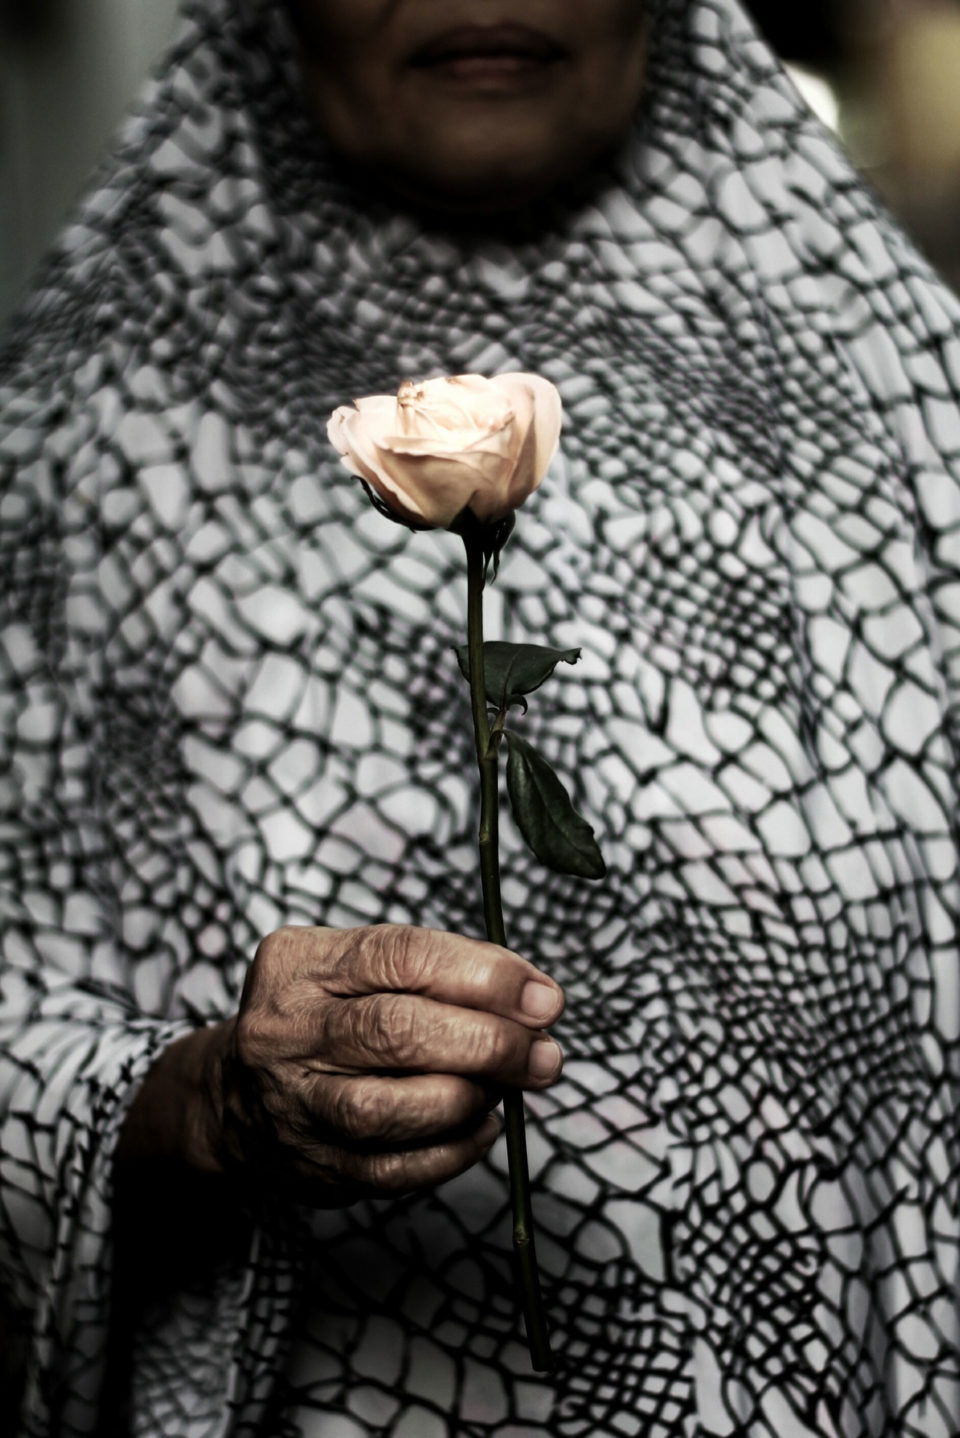 Rose (Rosa) - Adimas Pradana Andaru